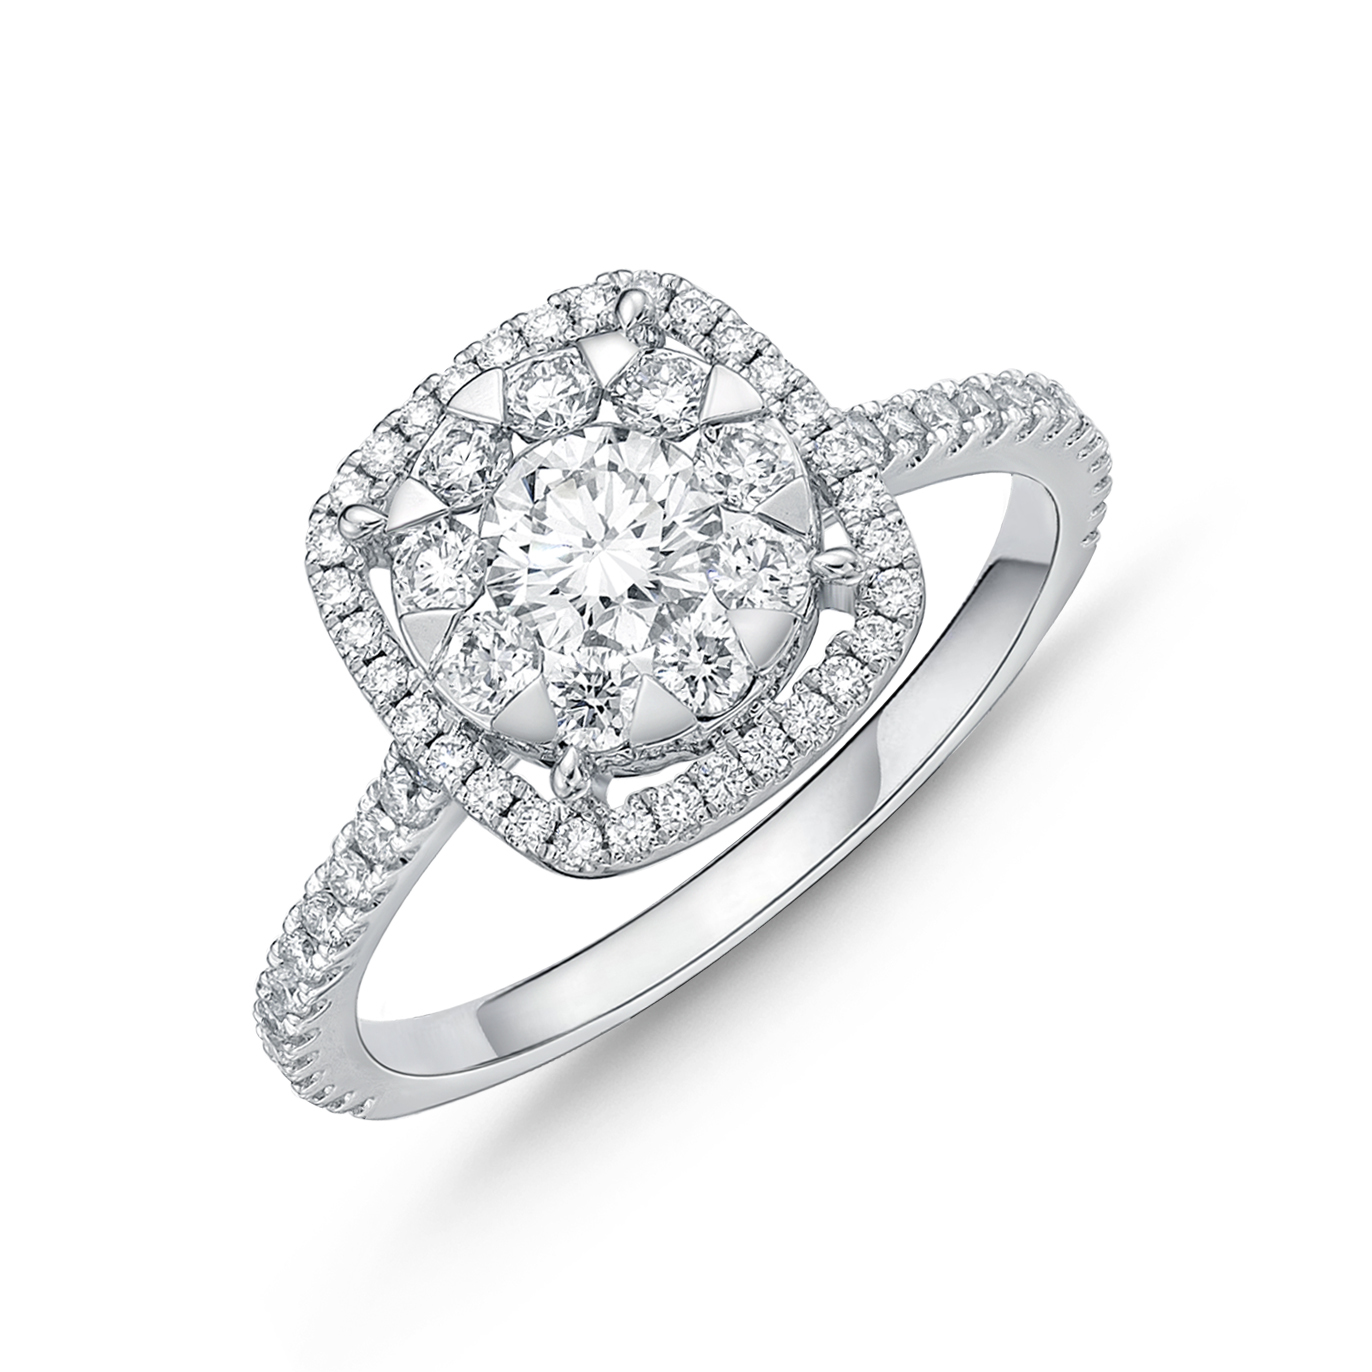 Memoire 18ct White Gold 0.60 Carat Diamond Bouquet Cushion Halo Solitaire Ring